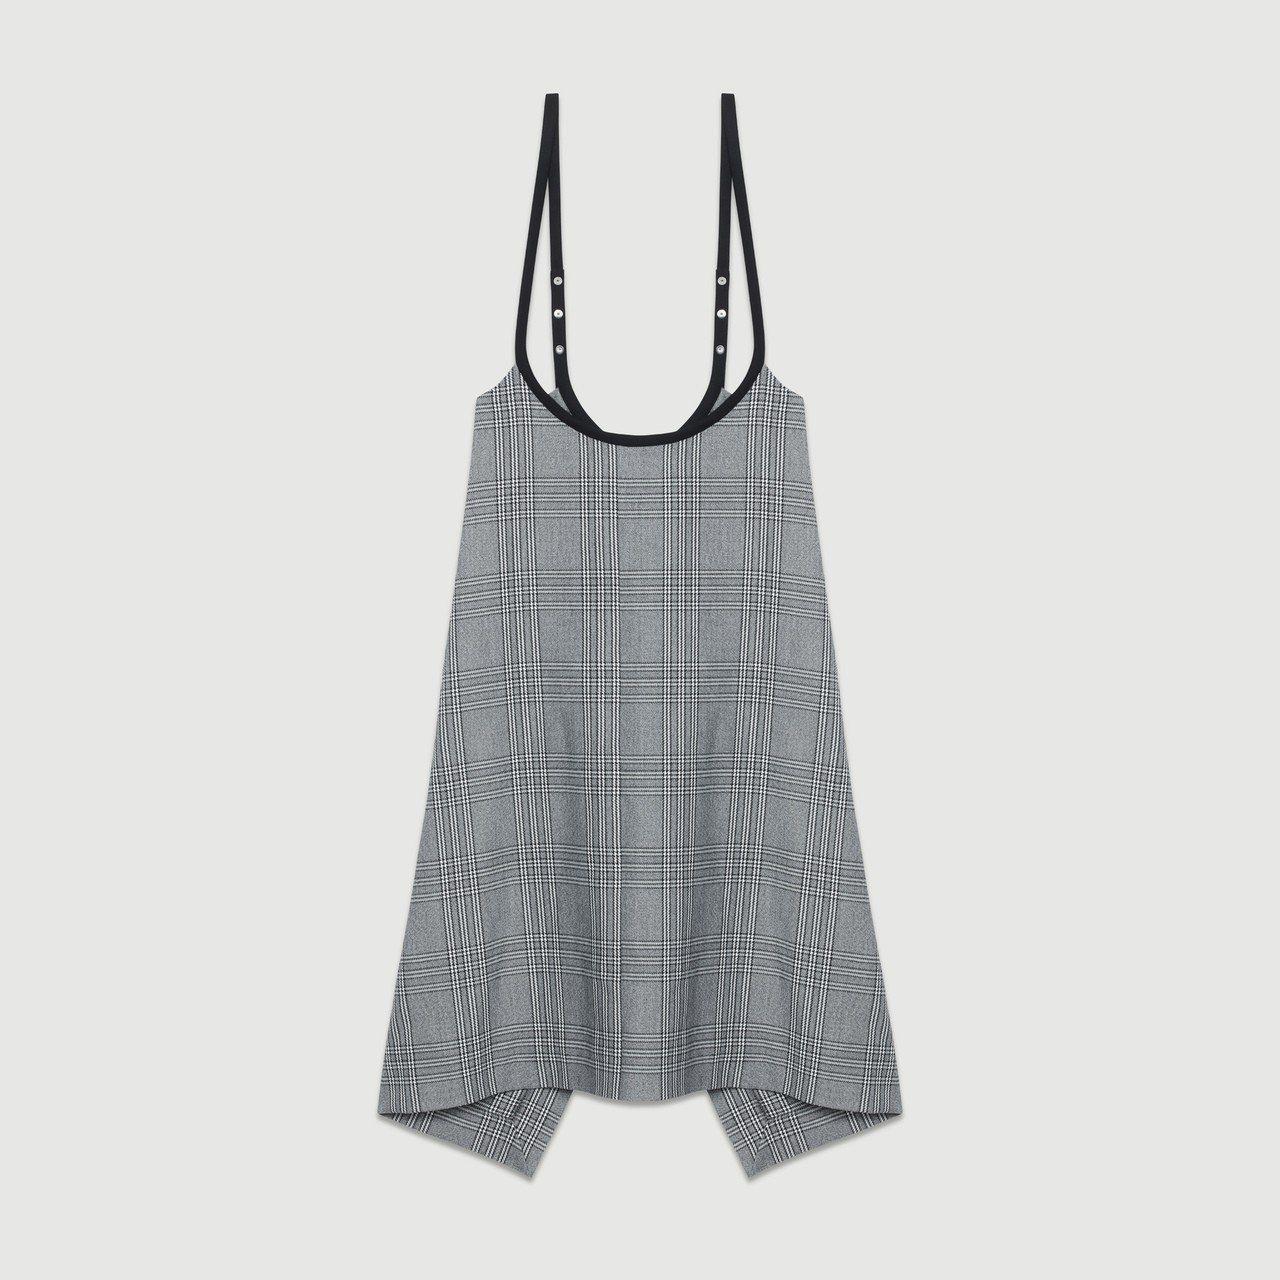 maje灰色格紋細肩帶洋裝,售價8,120元。圖/maje提供